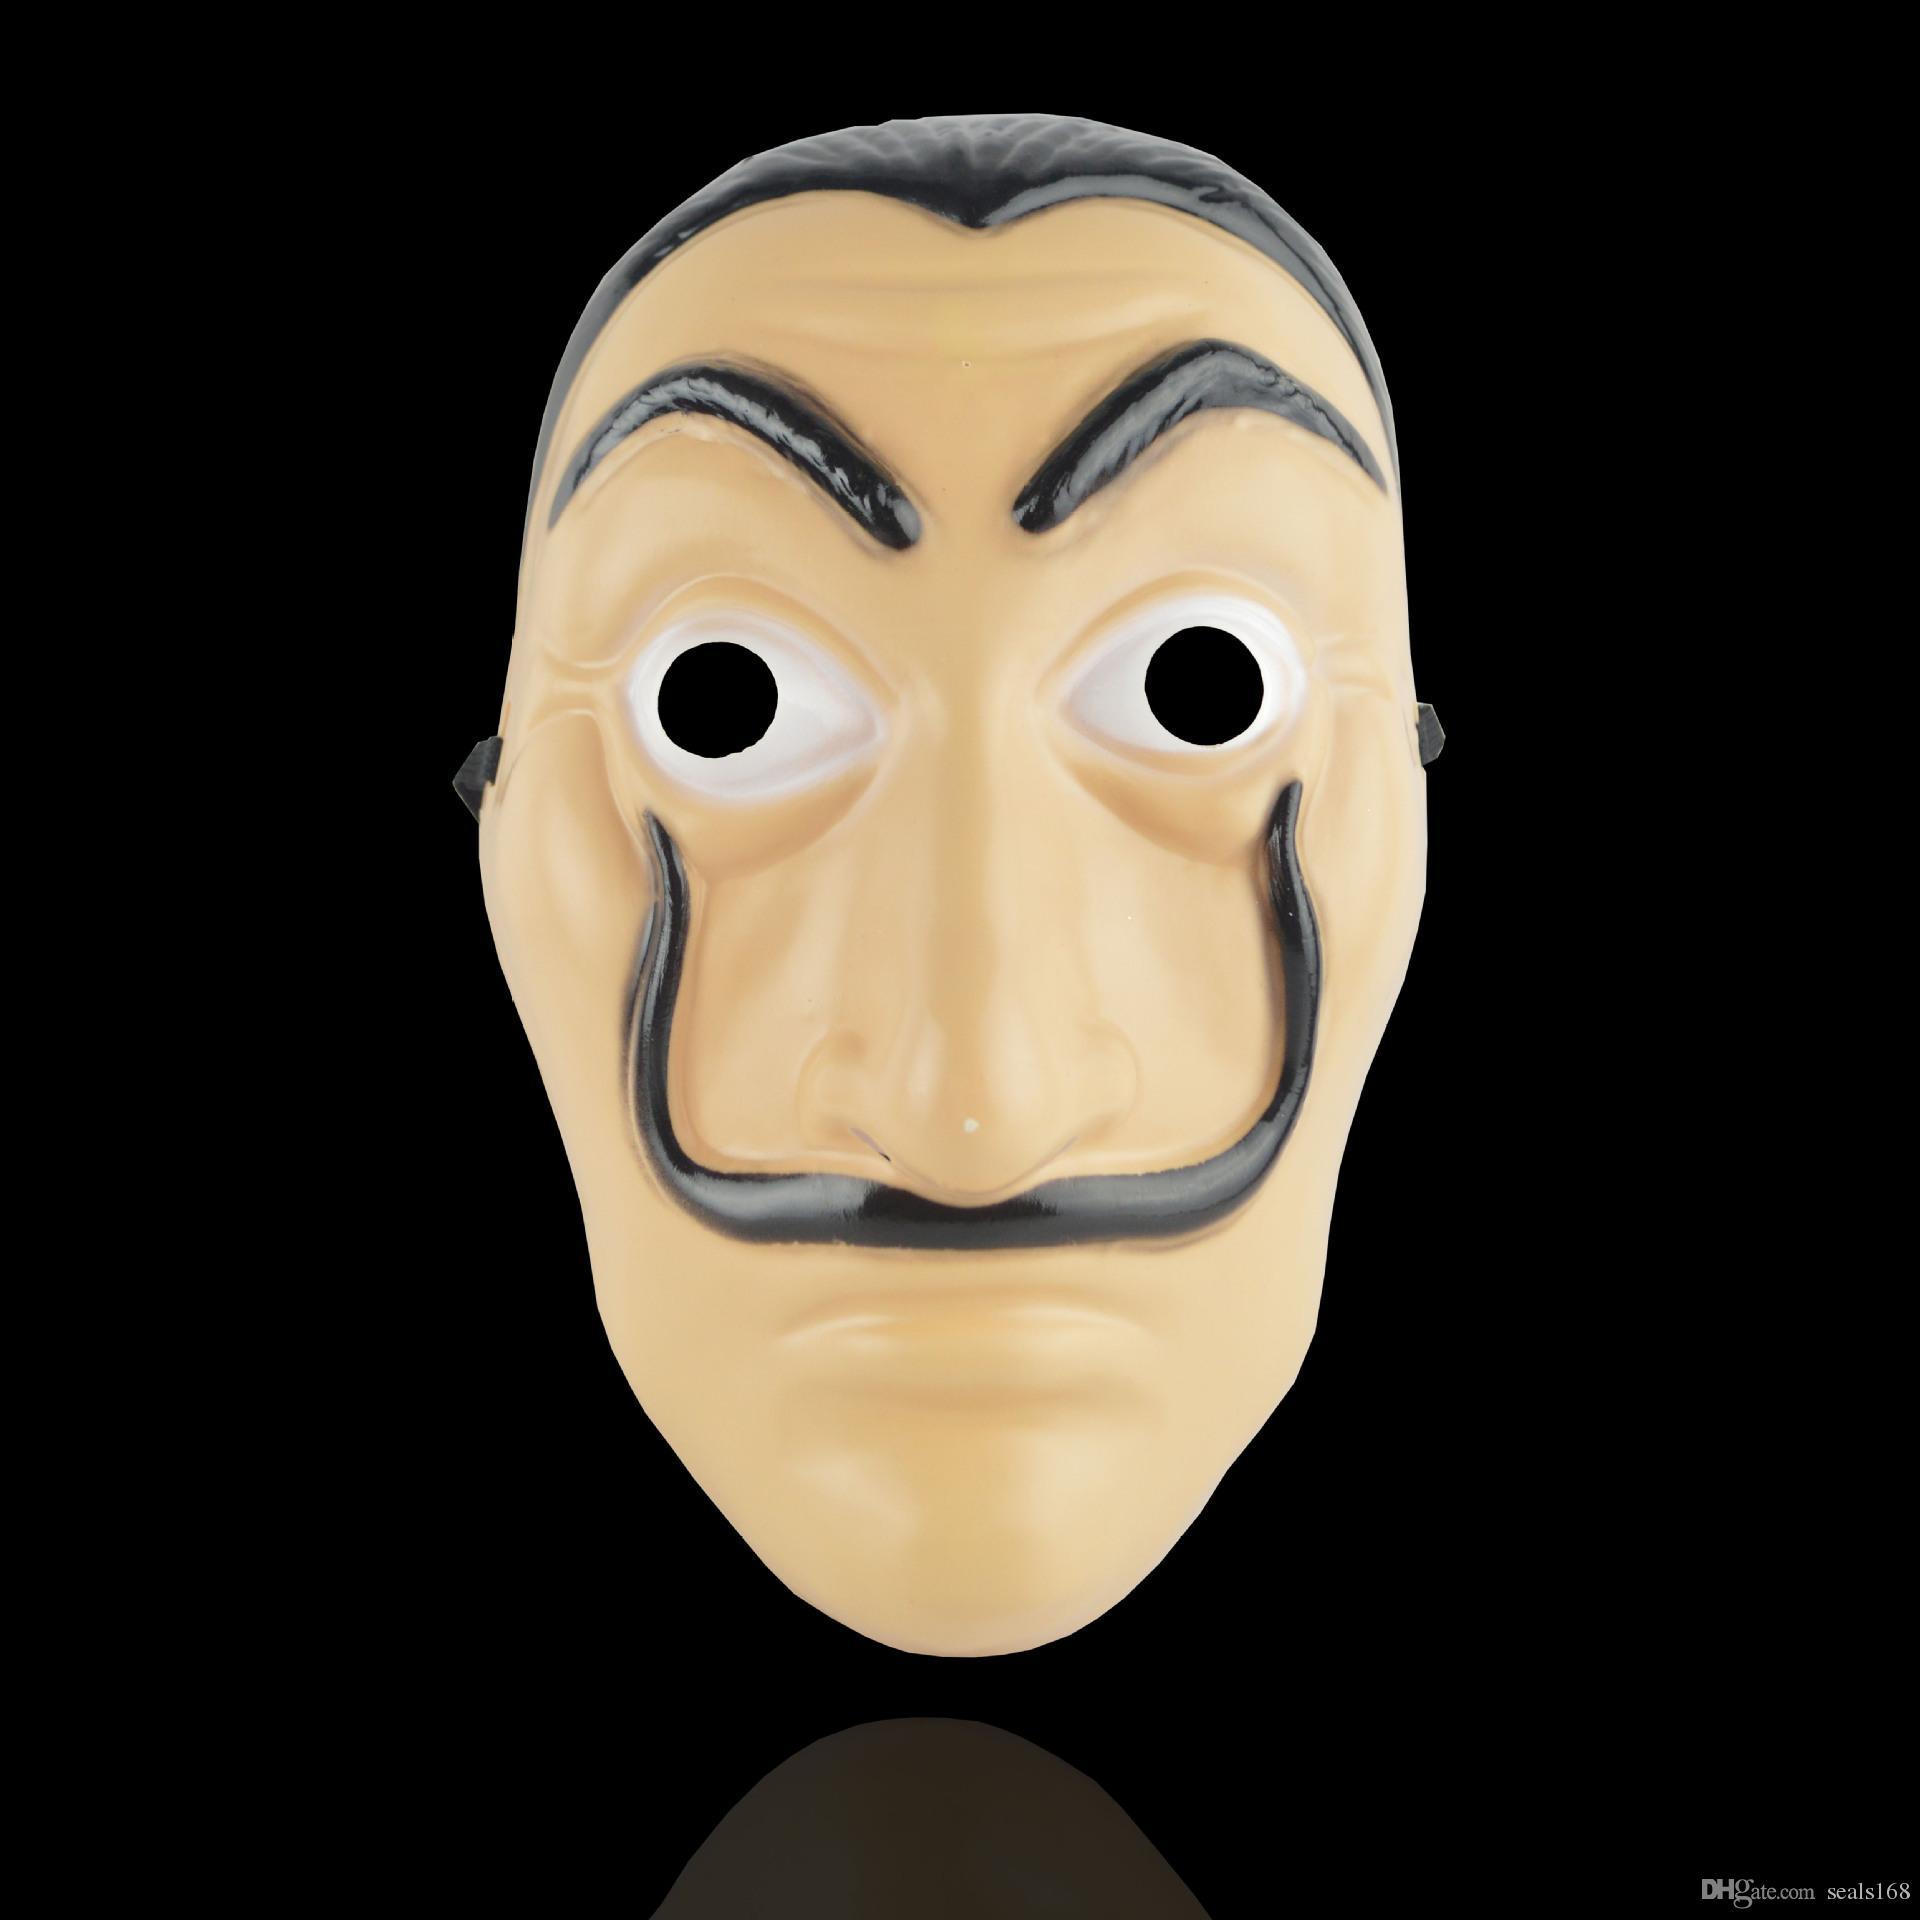 Cosplay Parti La Casa De Papel Yüz Salvador Dali Kostüm Film Gerçekçi Cadılar Bayramı XMAS HH7-929 Malzemeleri Maske Maske